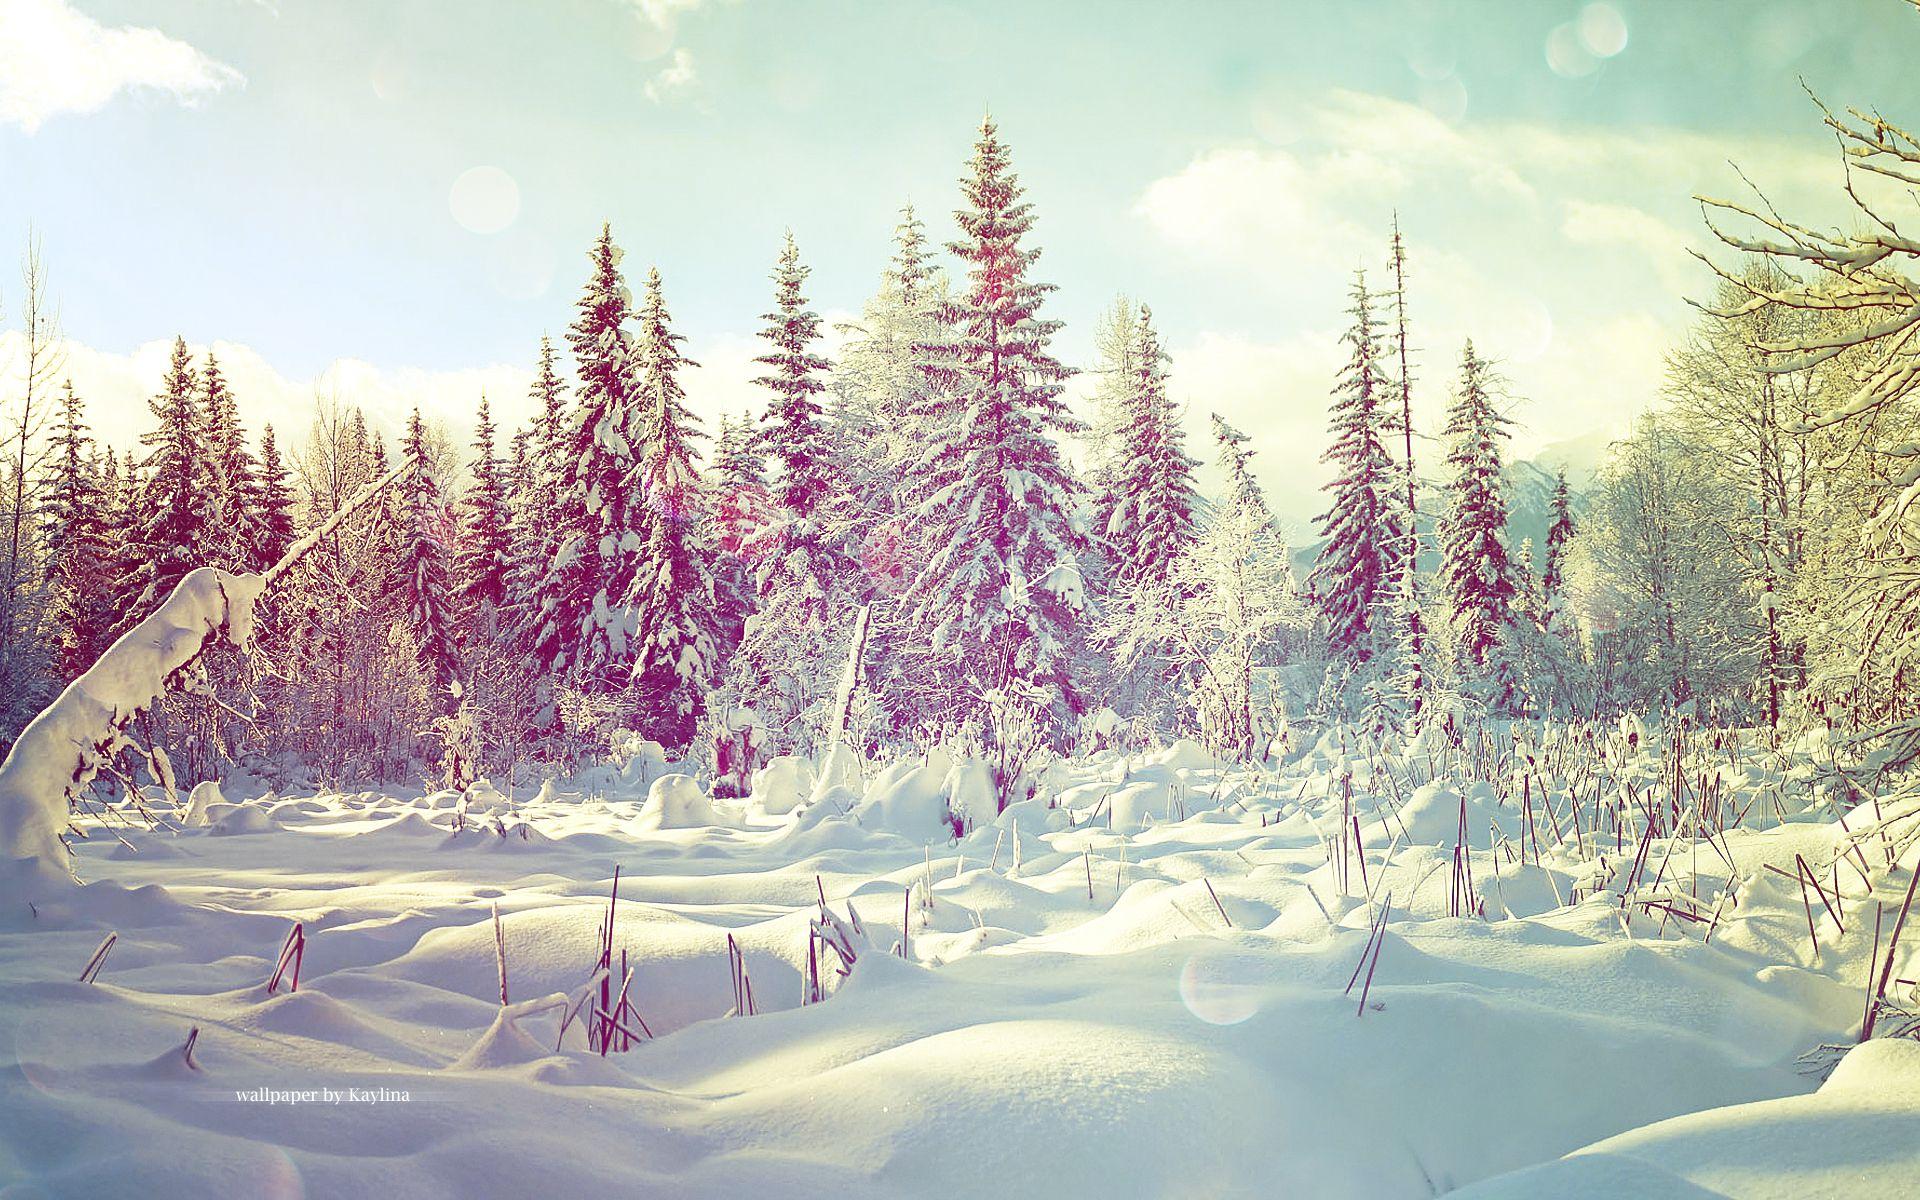 Winter wallpaper by on deviantART